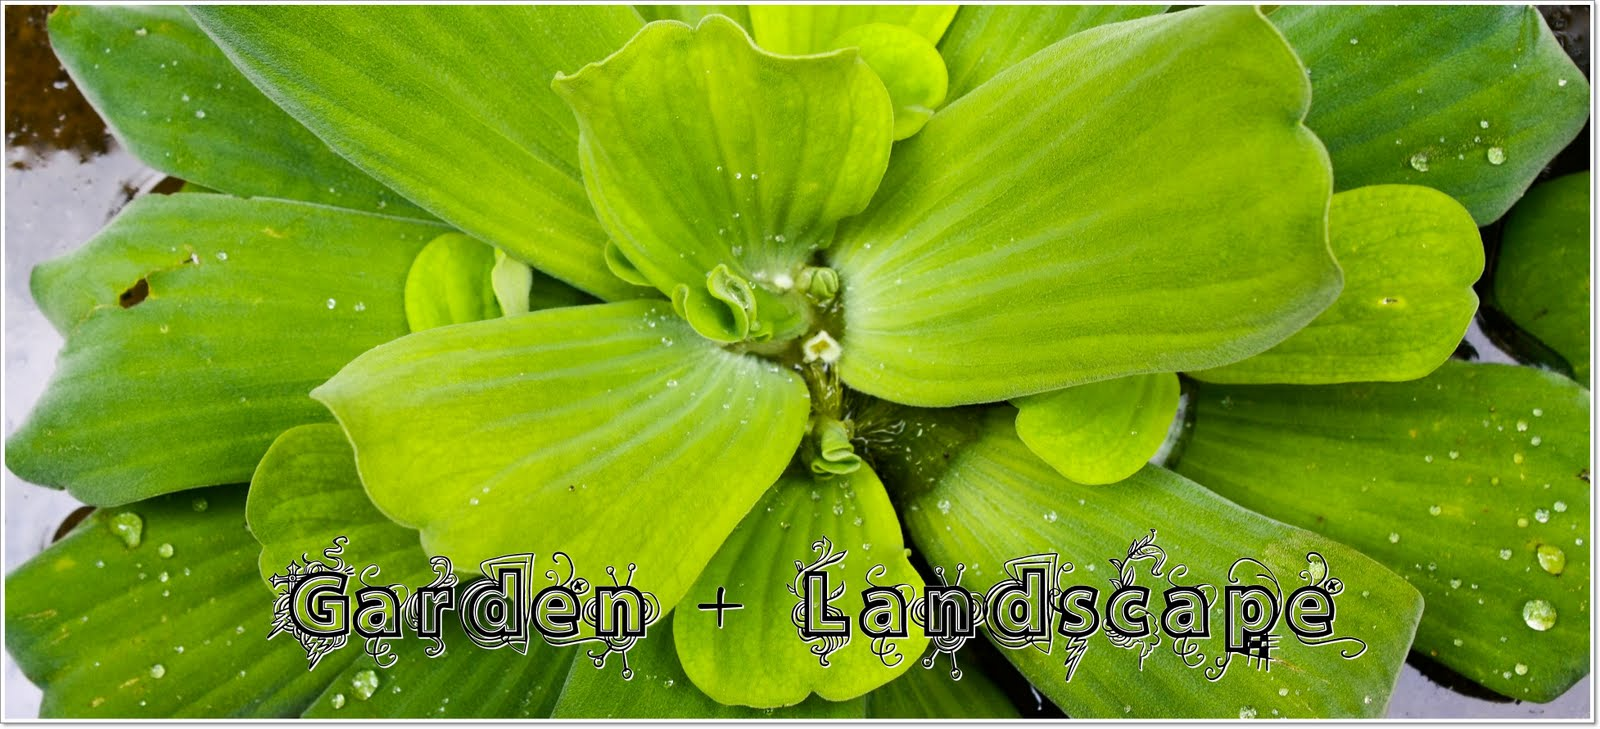 Sulong & Brothers Garden Landscape